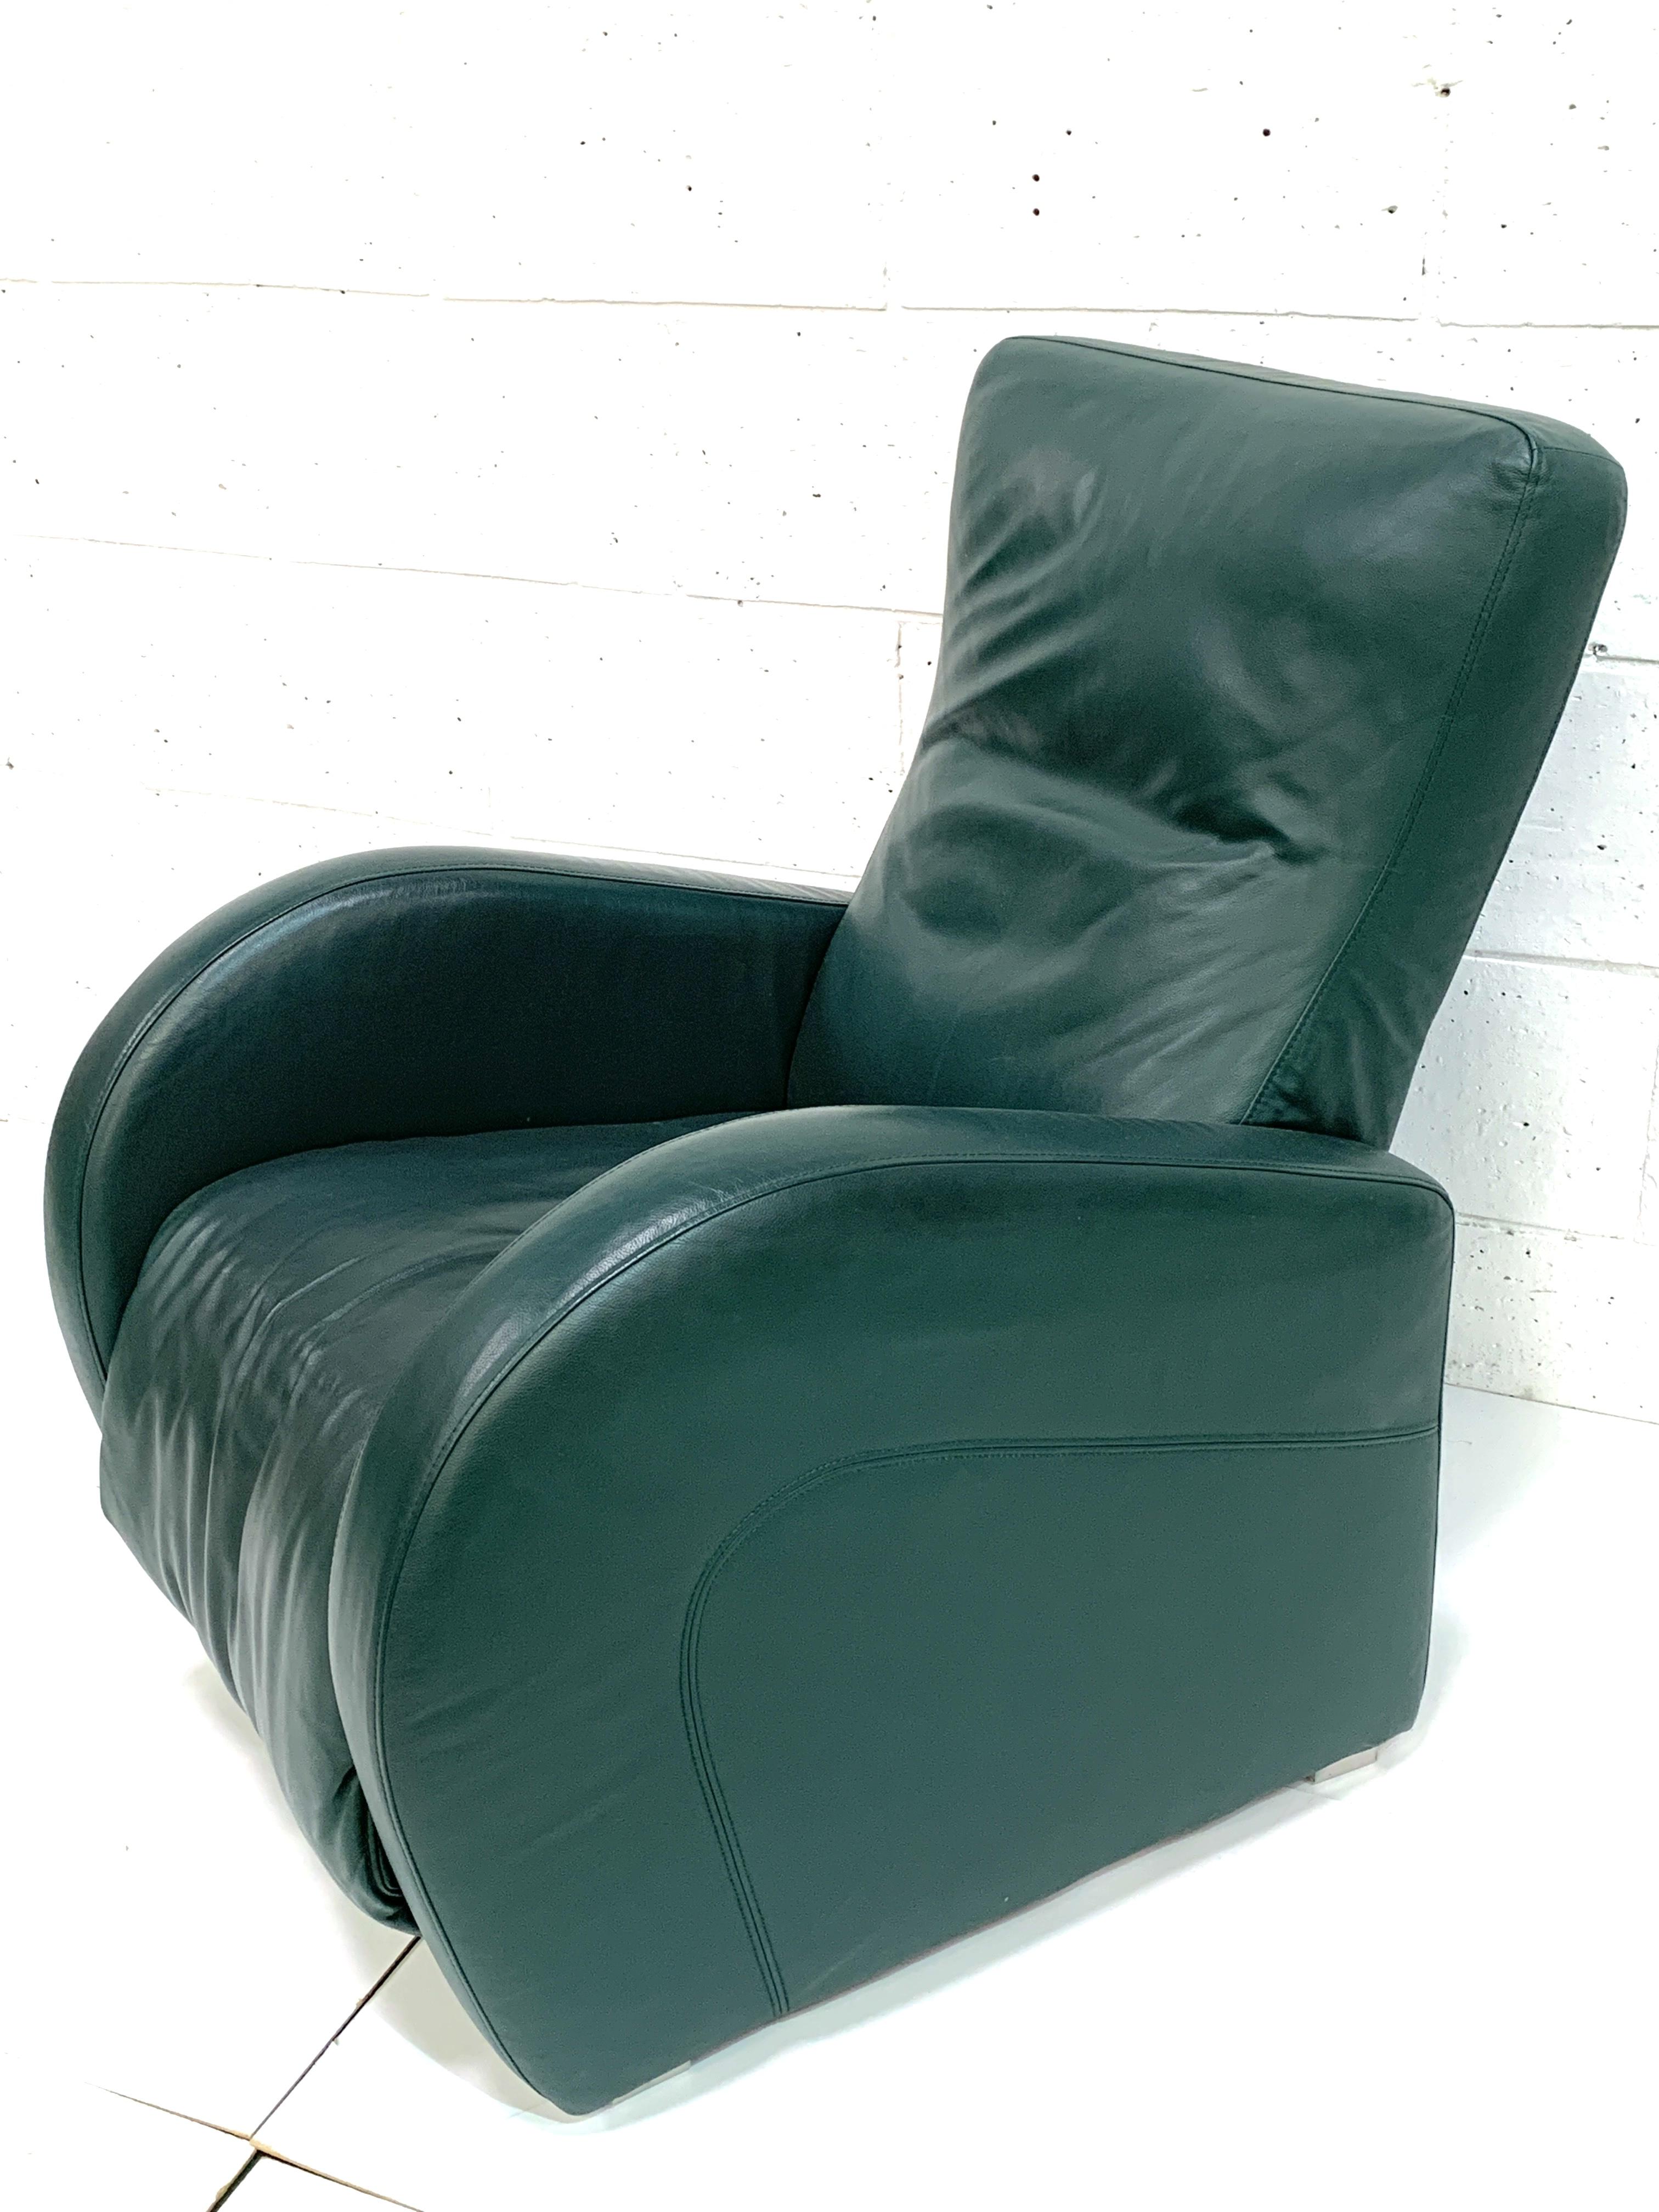 Steinhoff TV reclinable armchair - Image 4 of 4